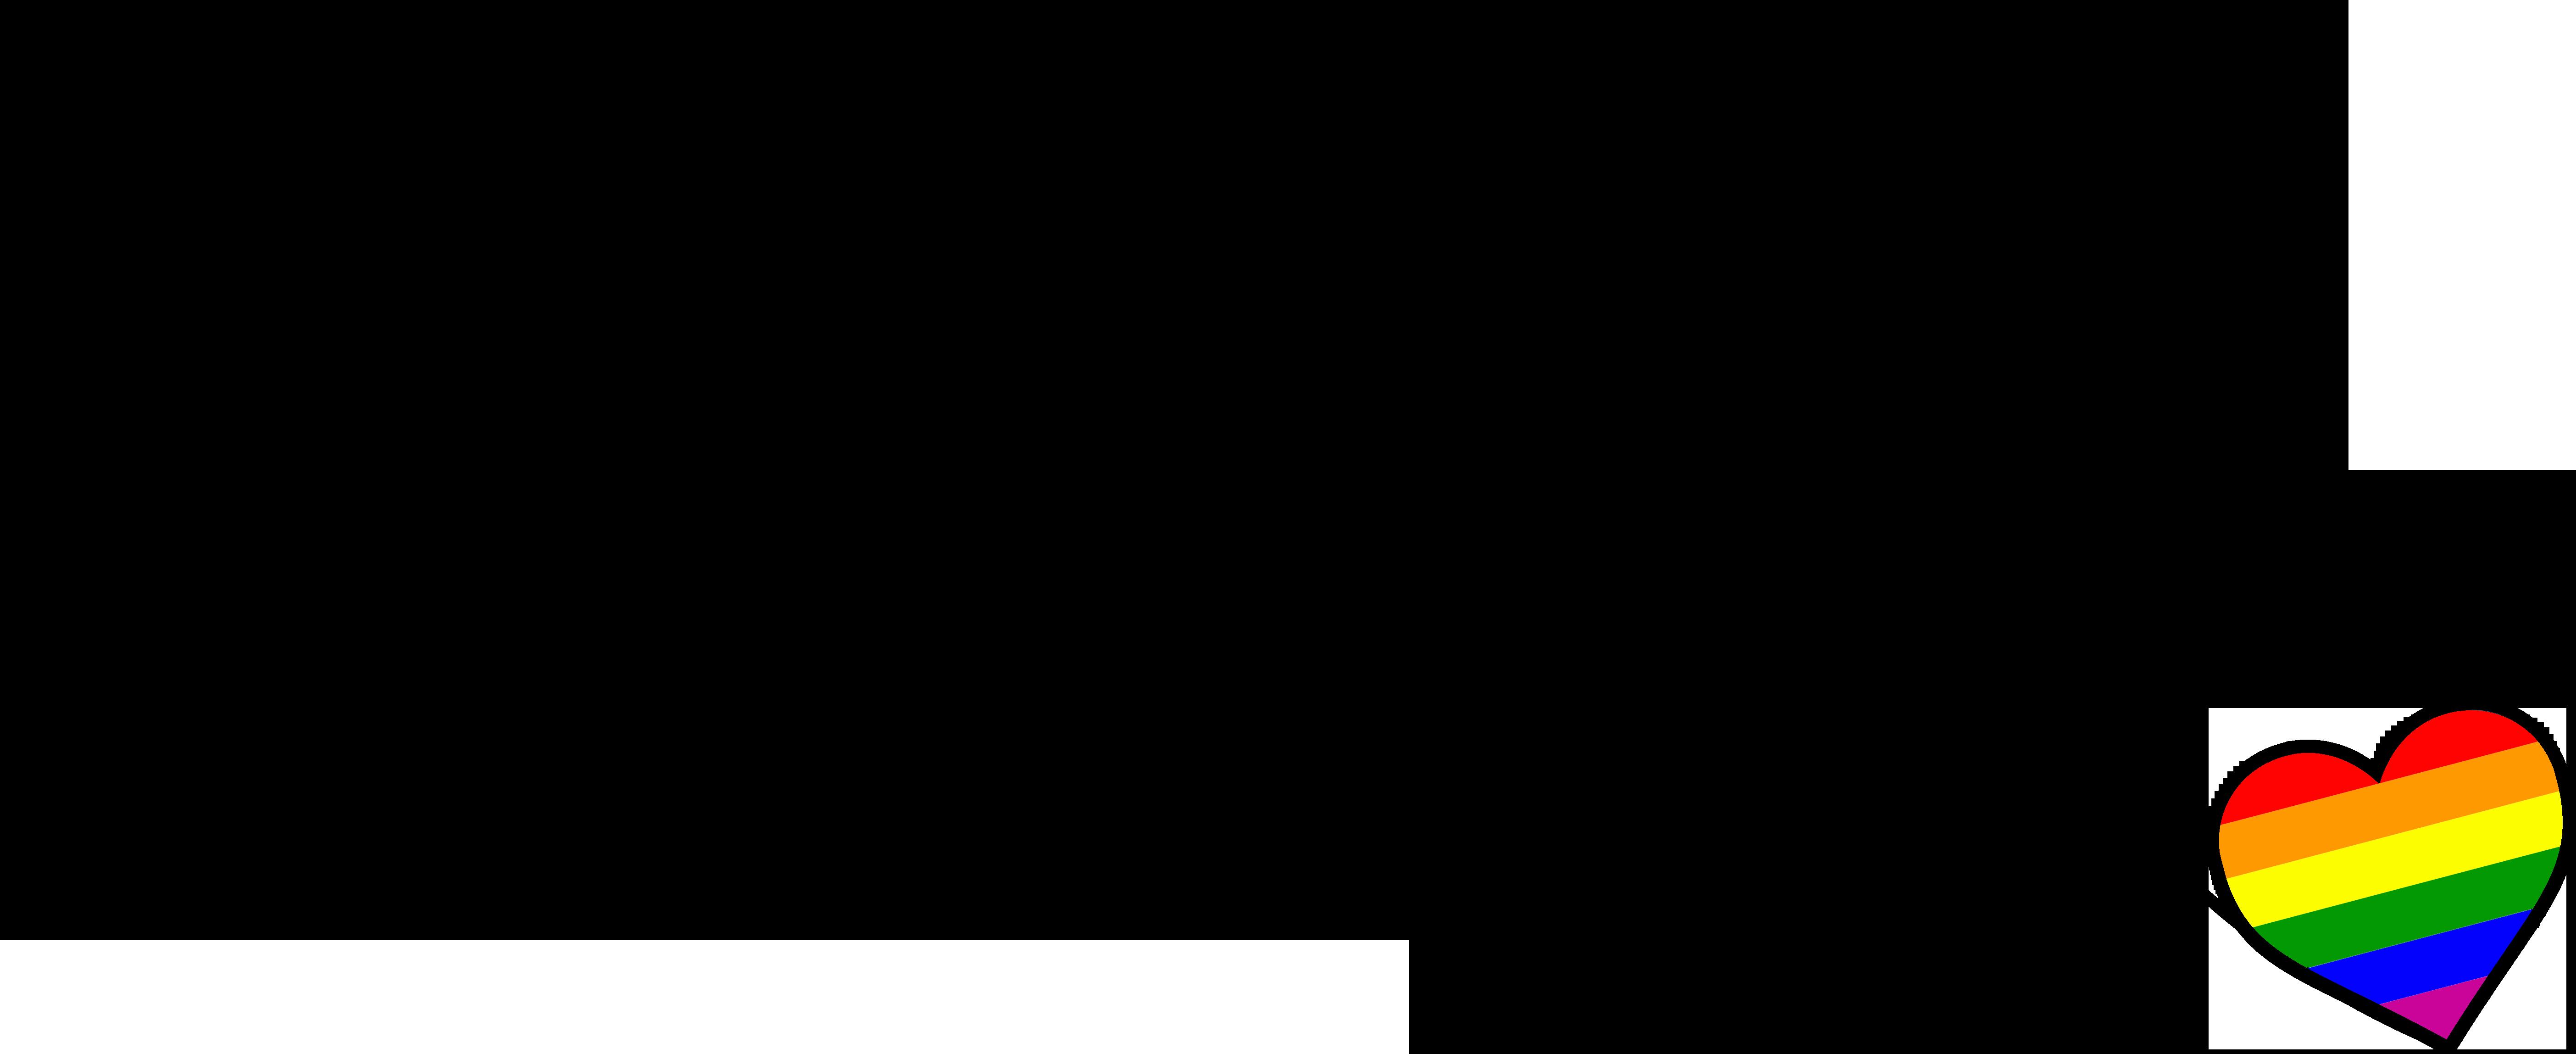 Queerly Represent Me logo